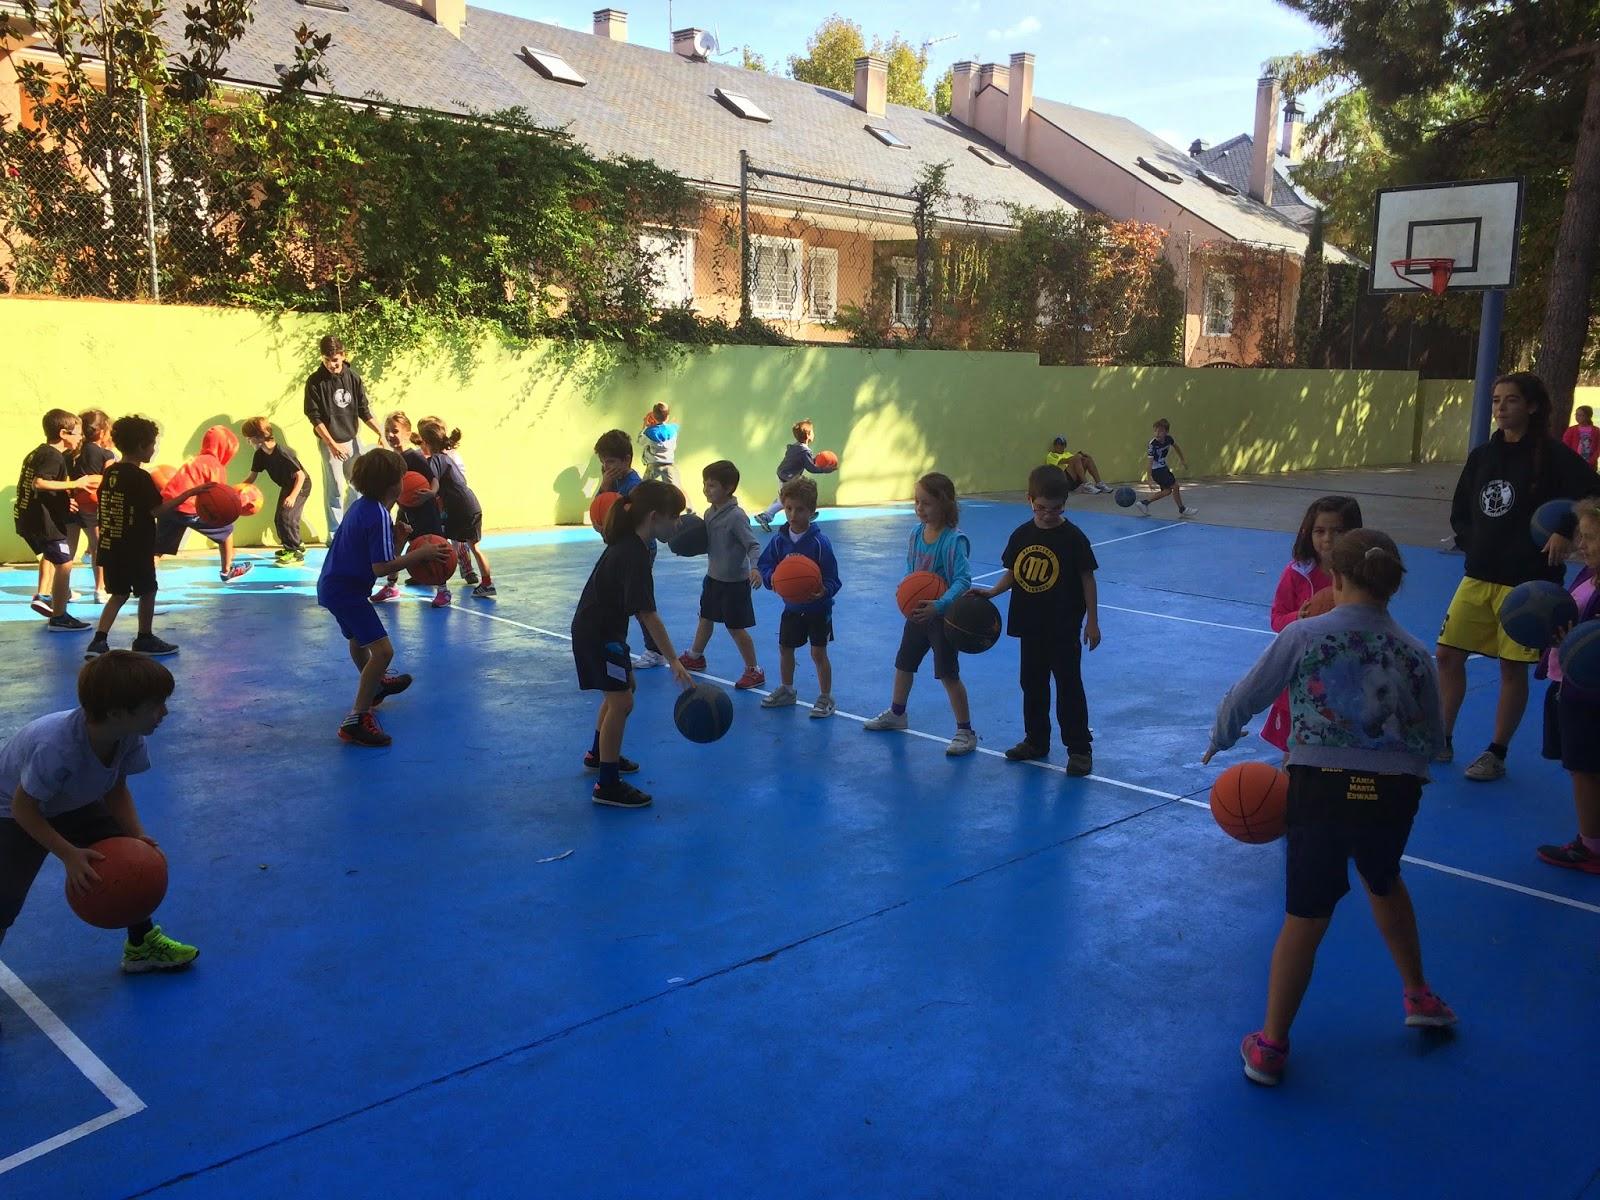 Baloncesto montessori escuela 04 10 2014 - Parque conde orgaz ...